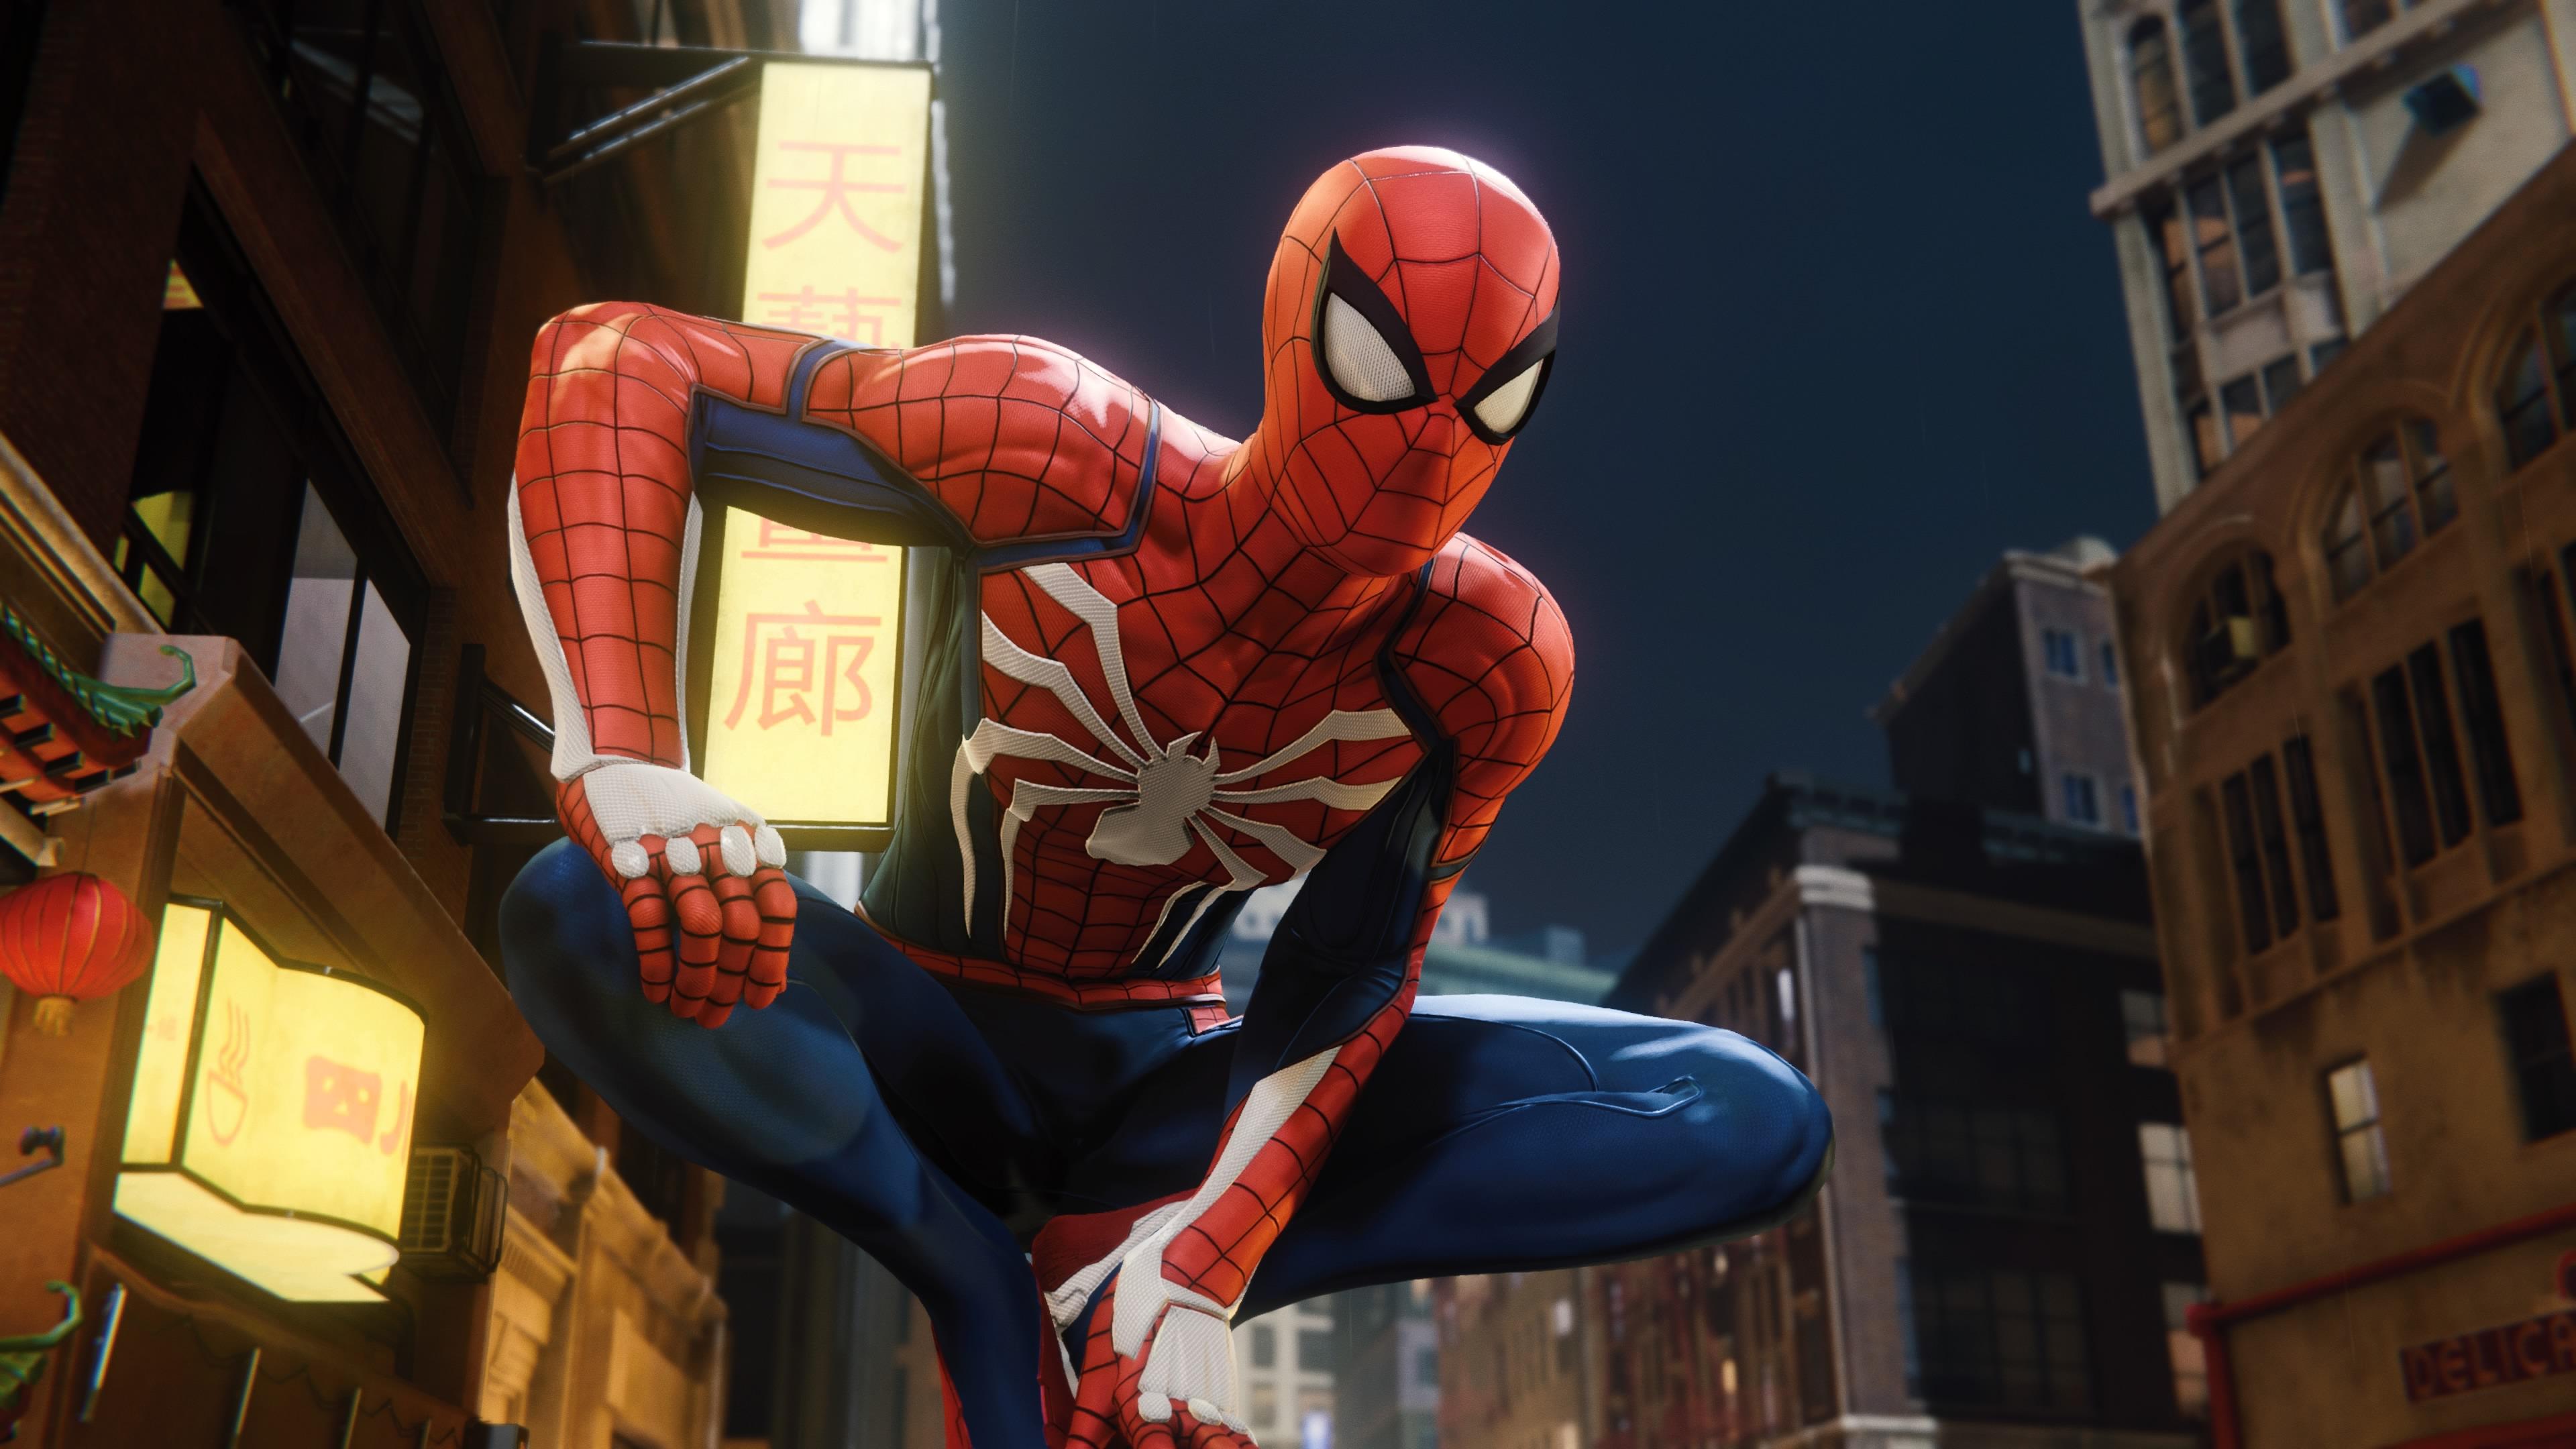 Spider-Man PS4 - Spidey perched